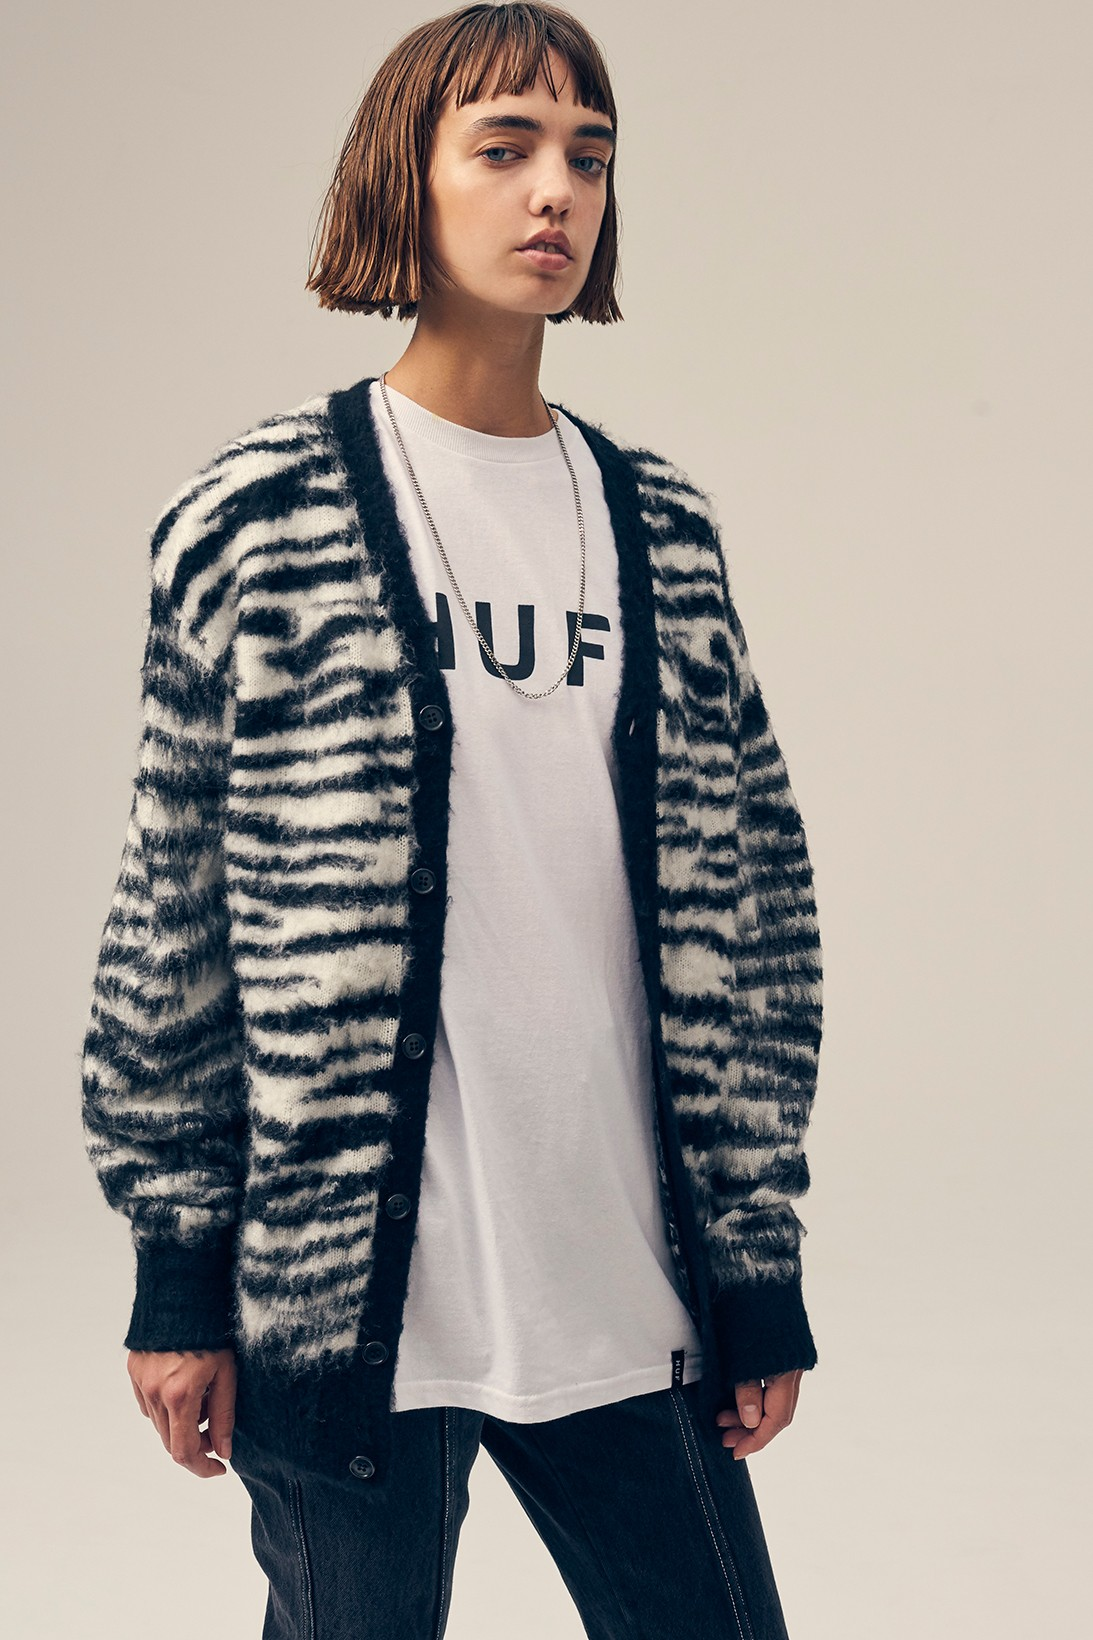 HUF Debuts Its Fall 2019 Women\u0027s Collection